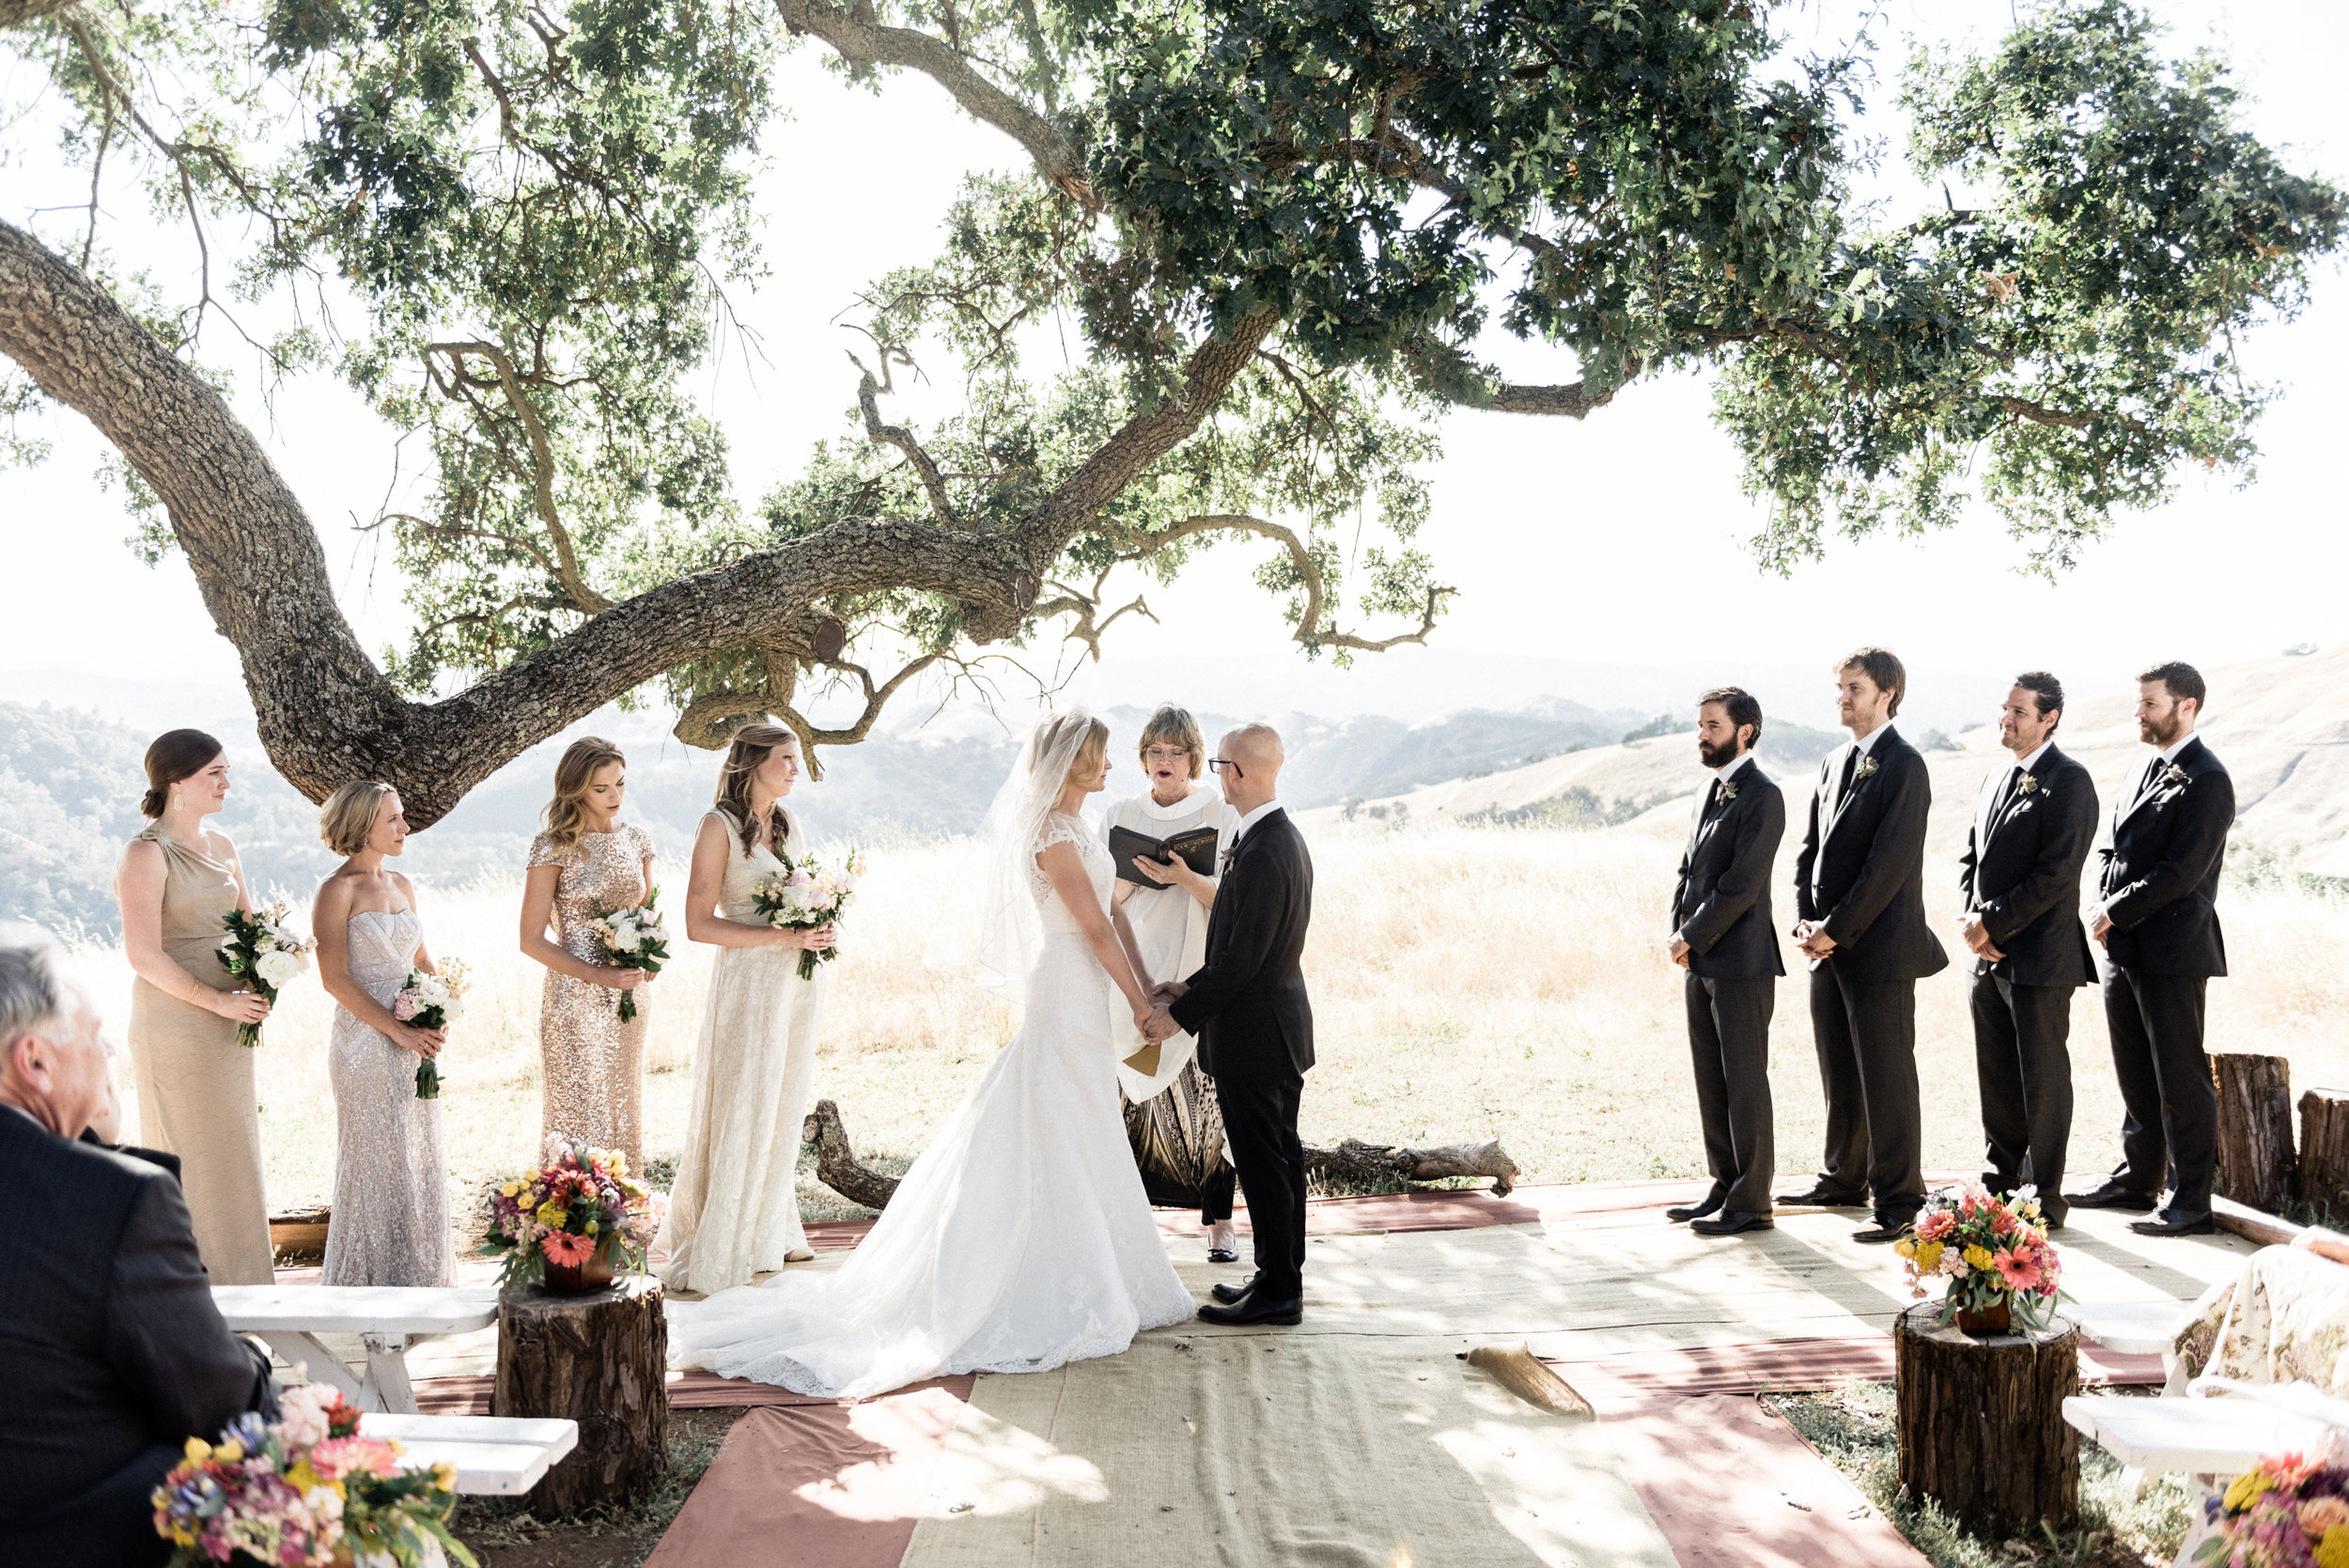 Outdoor+wedding+ceremony